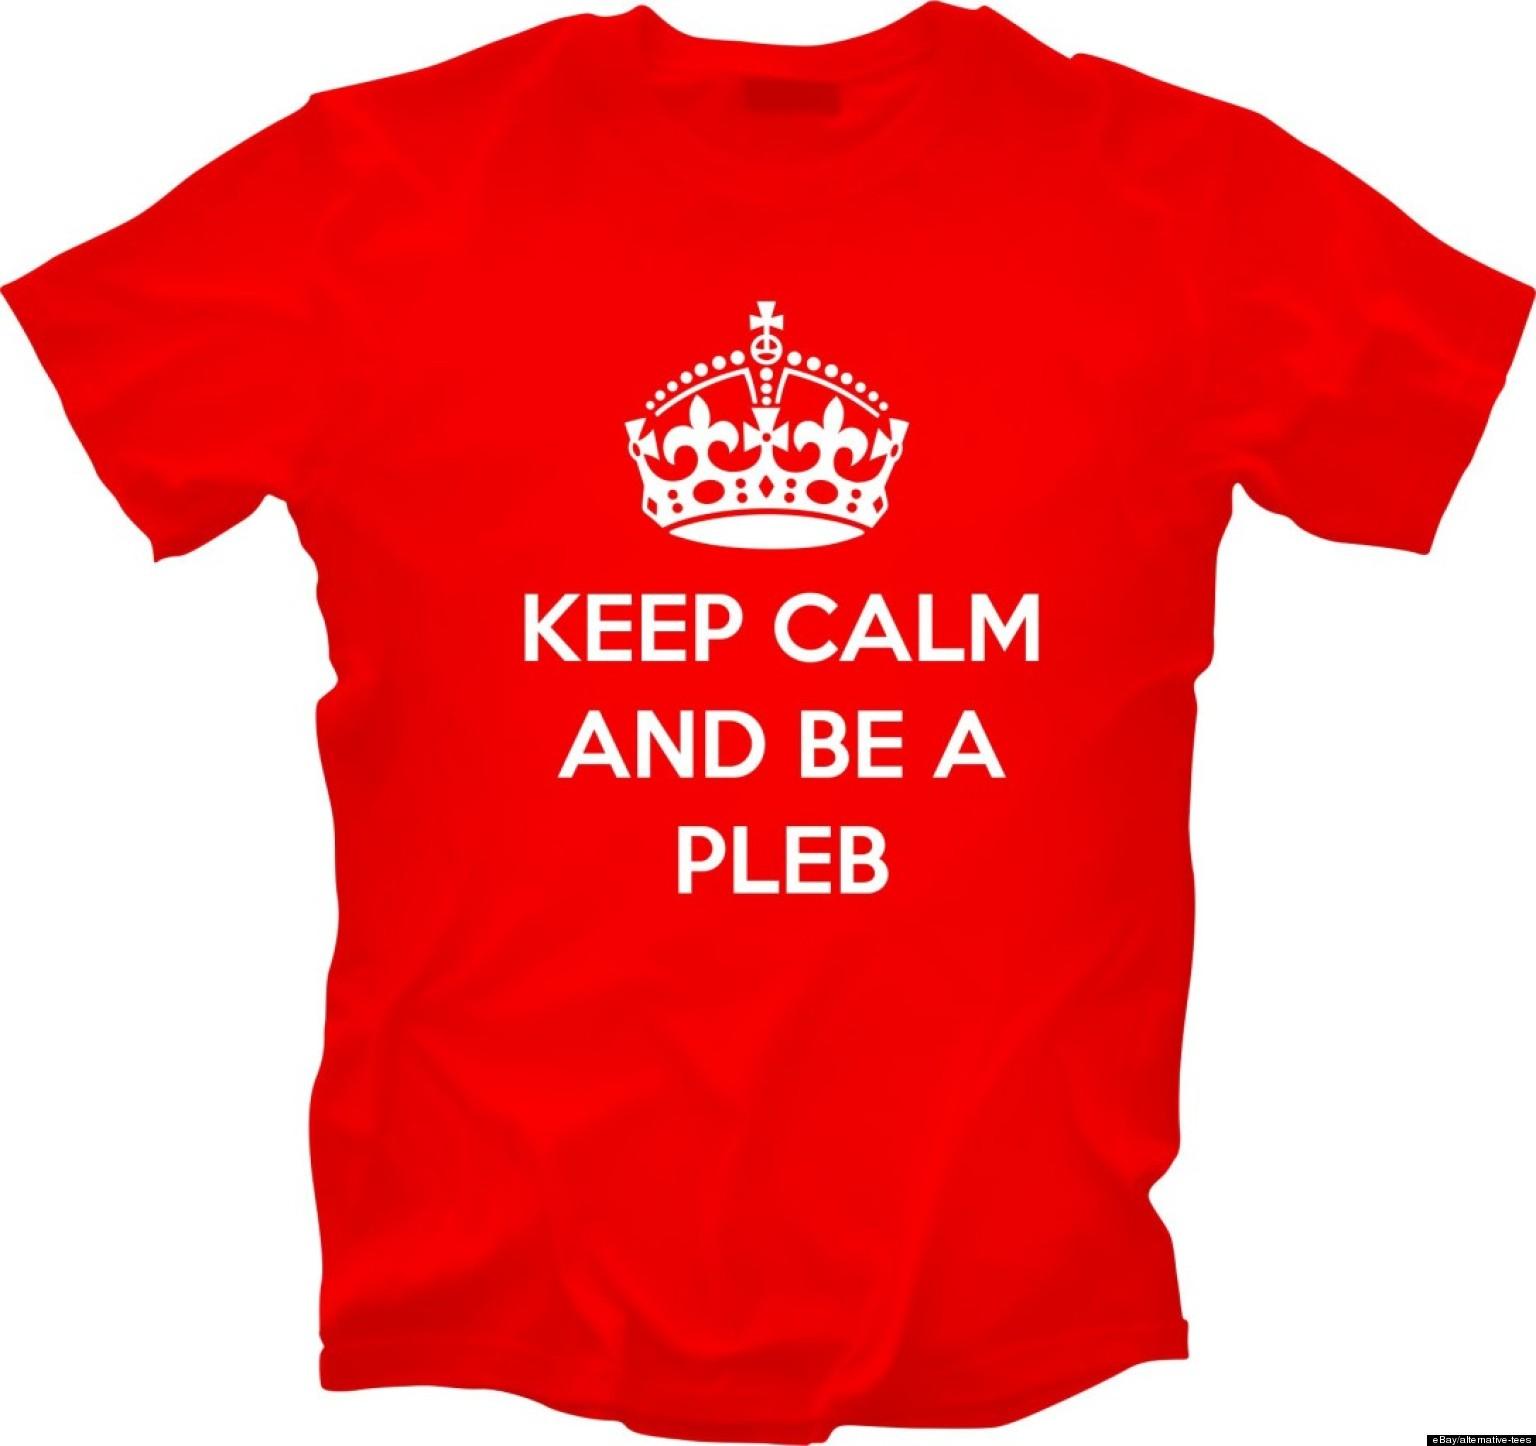 'Pleb' T-Shirts Now On Sale (PHOTOS)